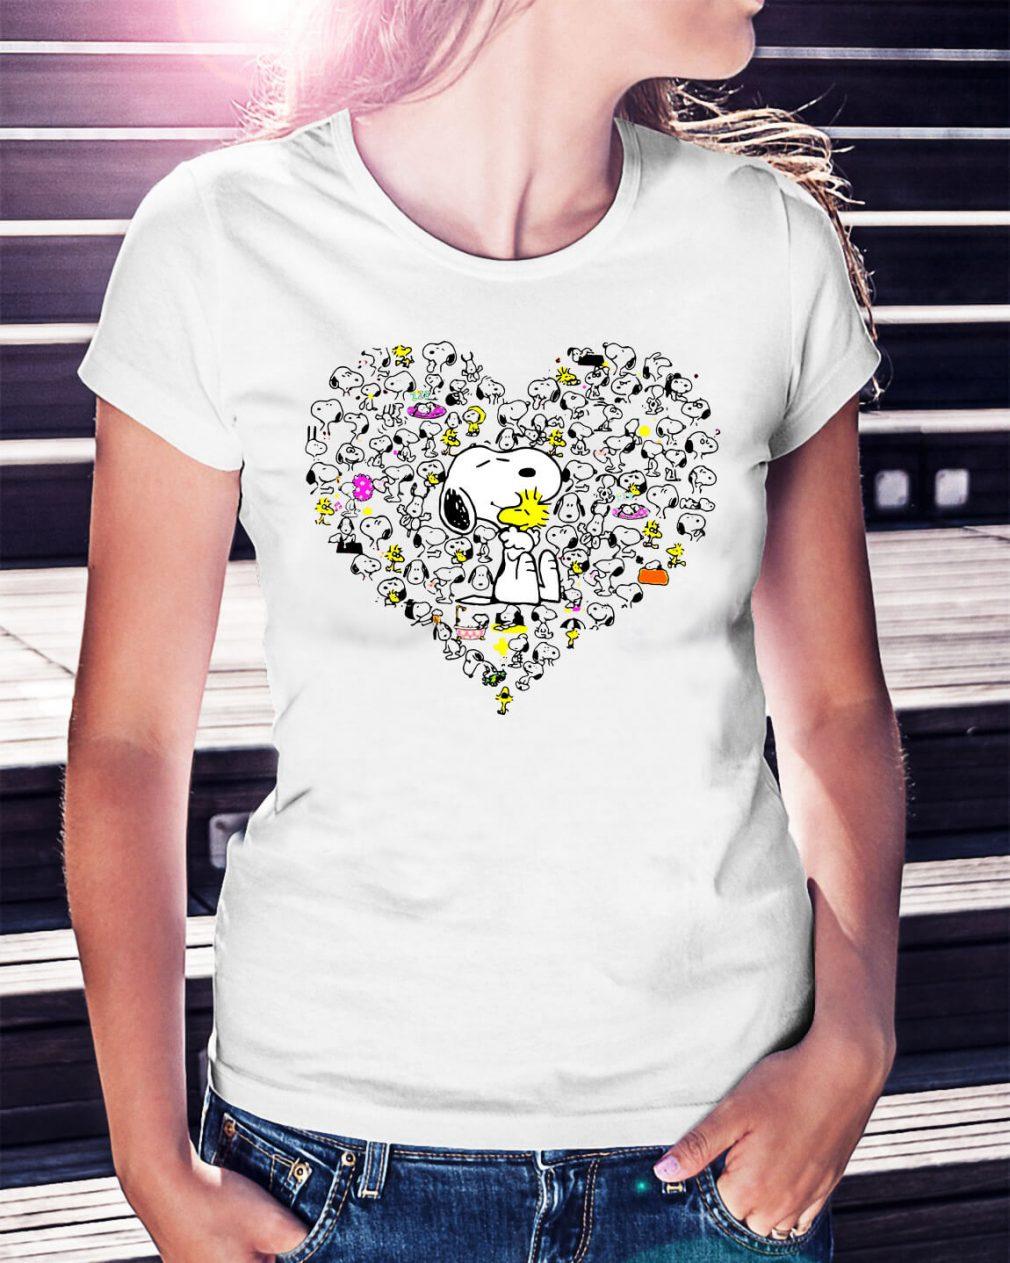 Snoopy hug Woodstock and hearts shirt